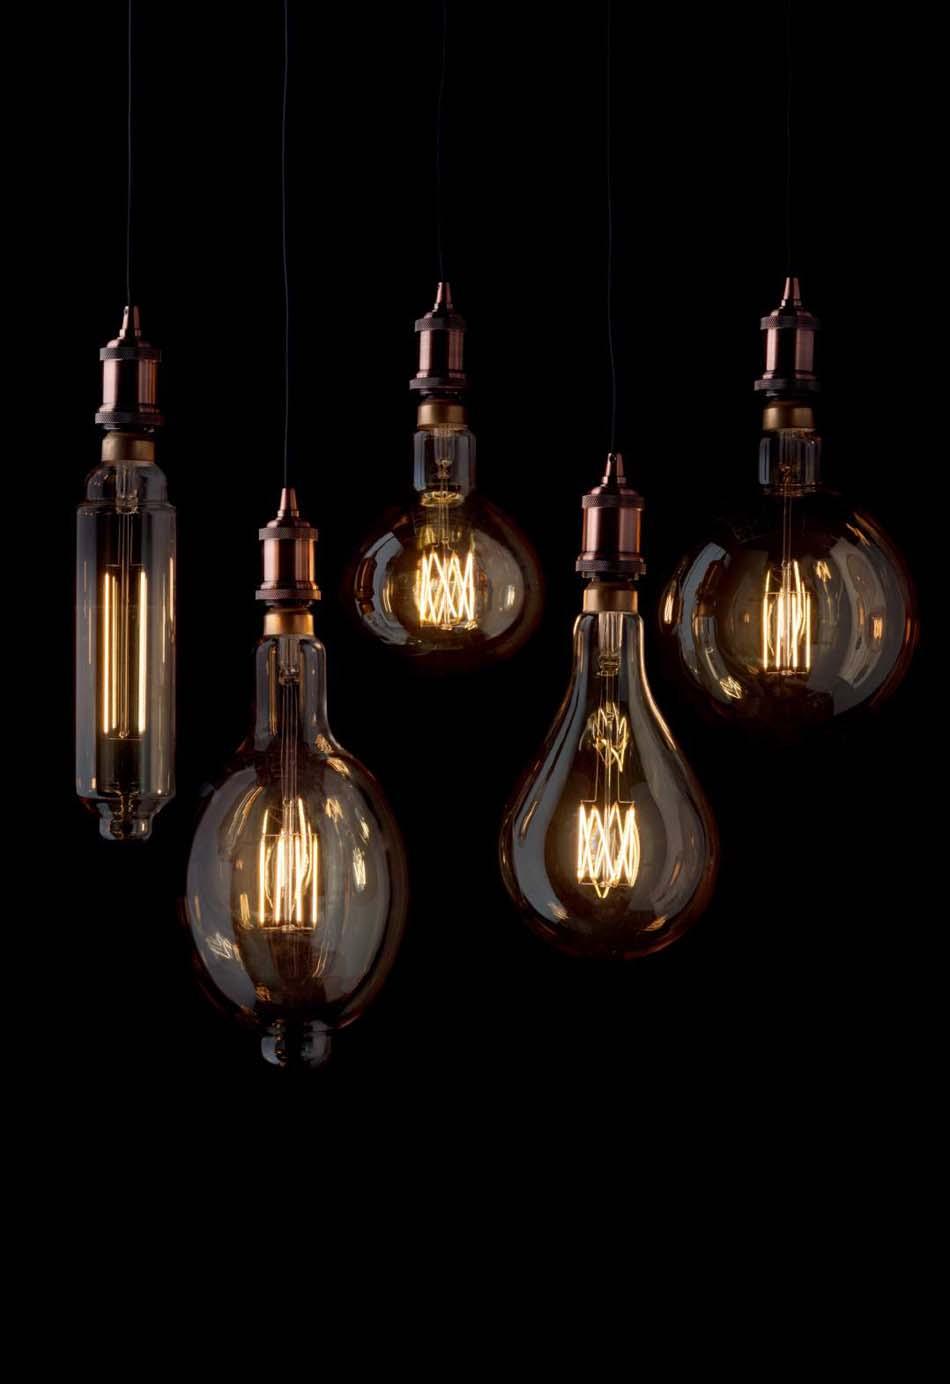 Lampade 54 sospese Ideal Lux LED Vintage xl – Toscana Arredamenti